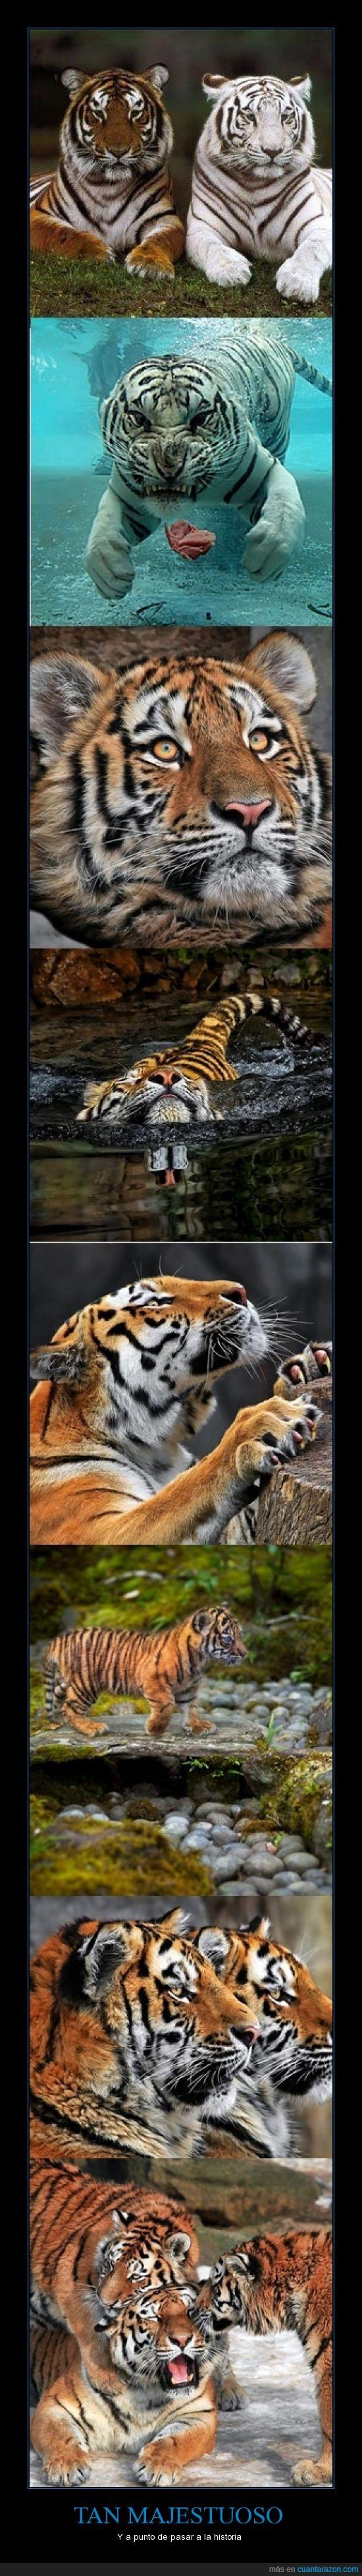 bengala,historia,majestuoso,tigre